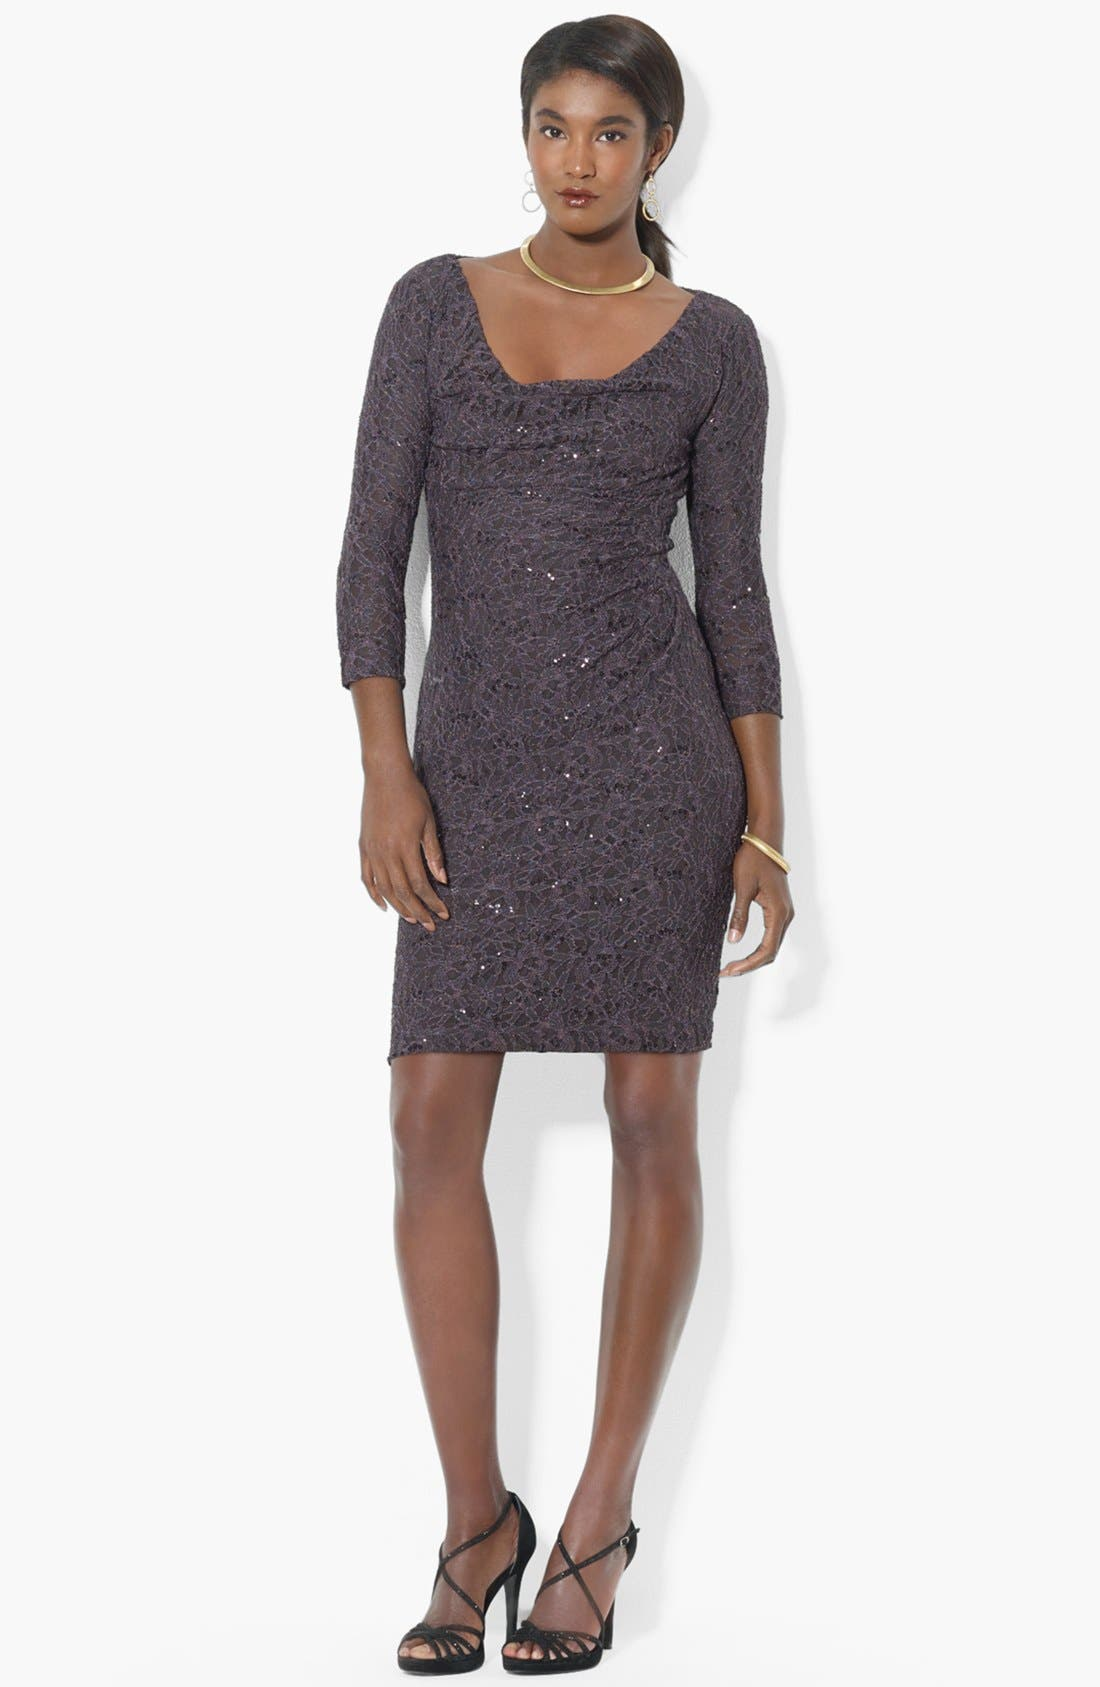 Alternate Image 1 Selected - Lauren Ralph Lauren Sequin Lace Sheath Dress